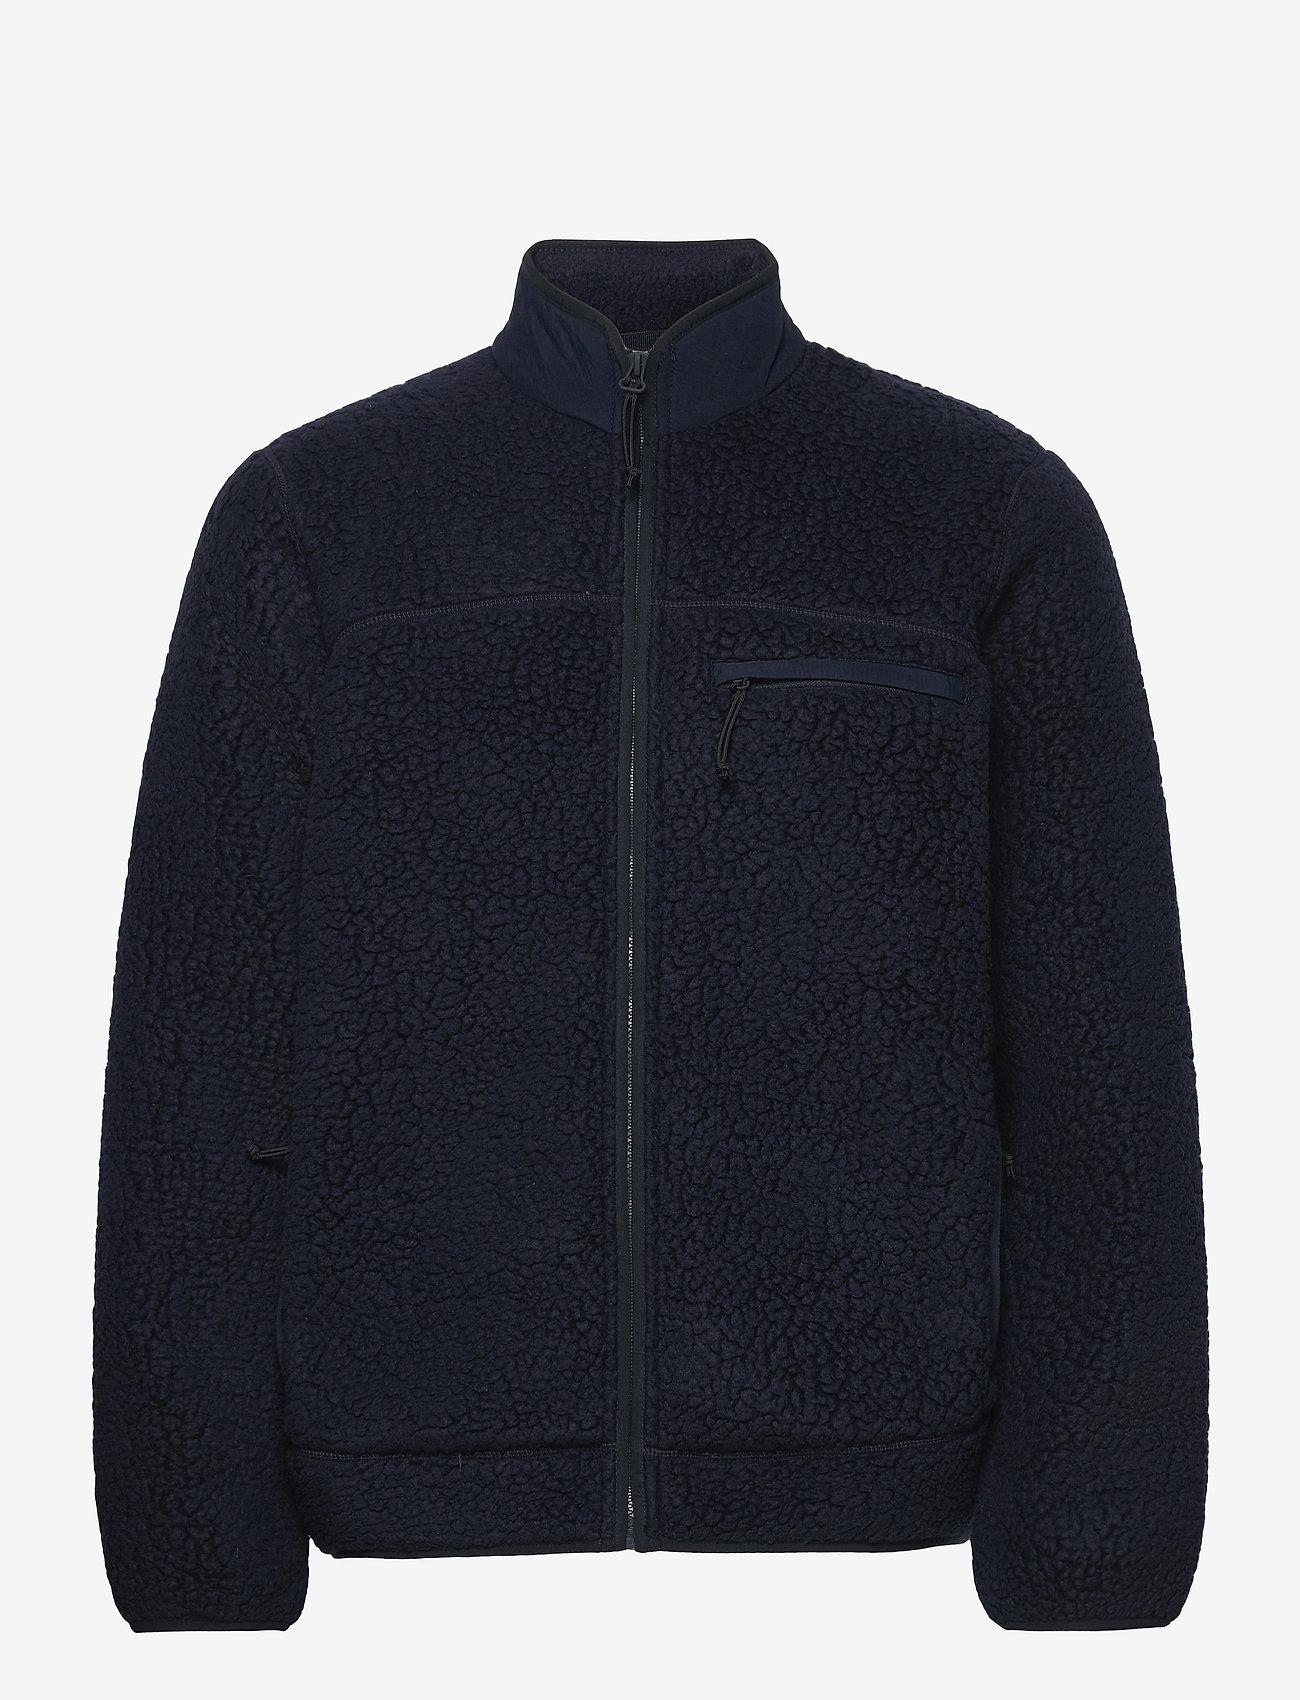 J.Crew - Polar Sherpa Fz Jkt - basic-sweatshirts - blue - 0